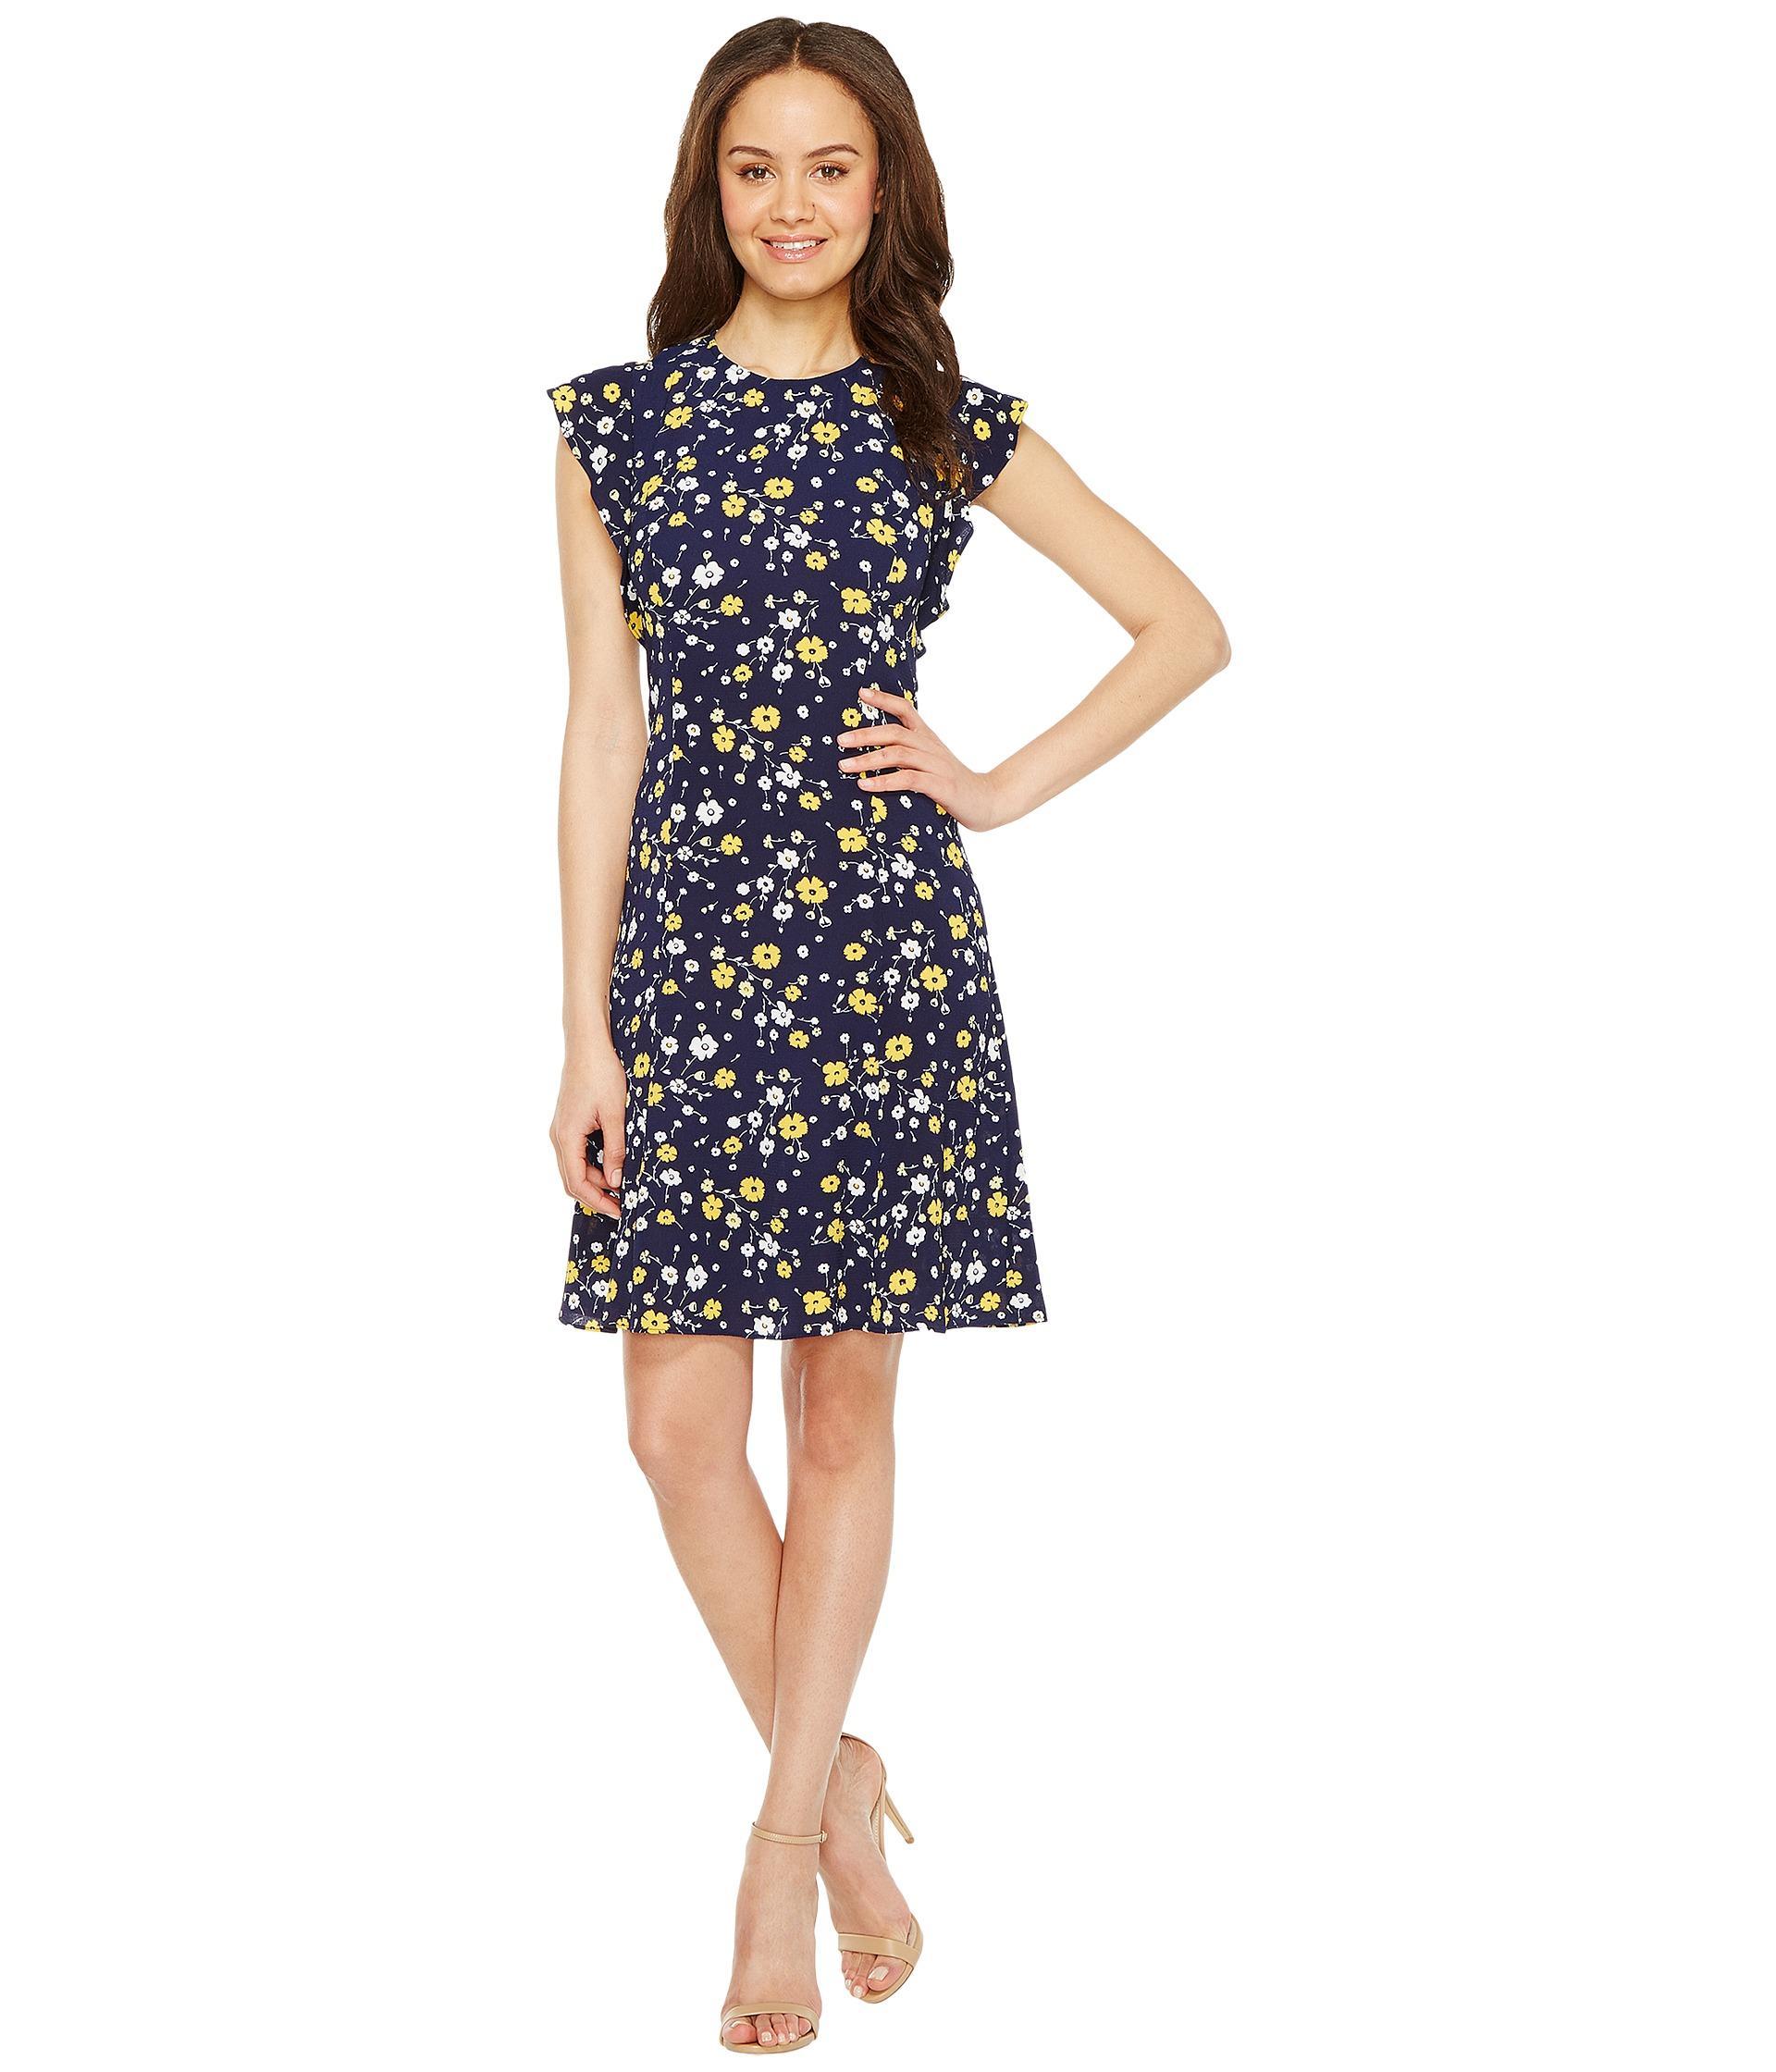 98f49599258 MICHAEL Michael Kors Verbena Flounce Sleeve Dress in Blue - Lyst